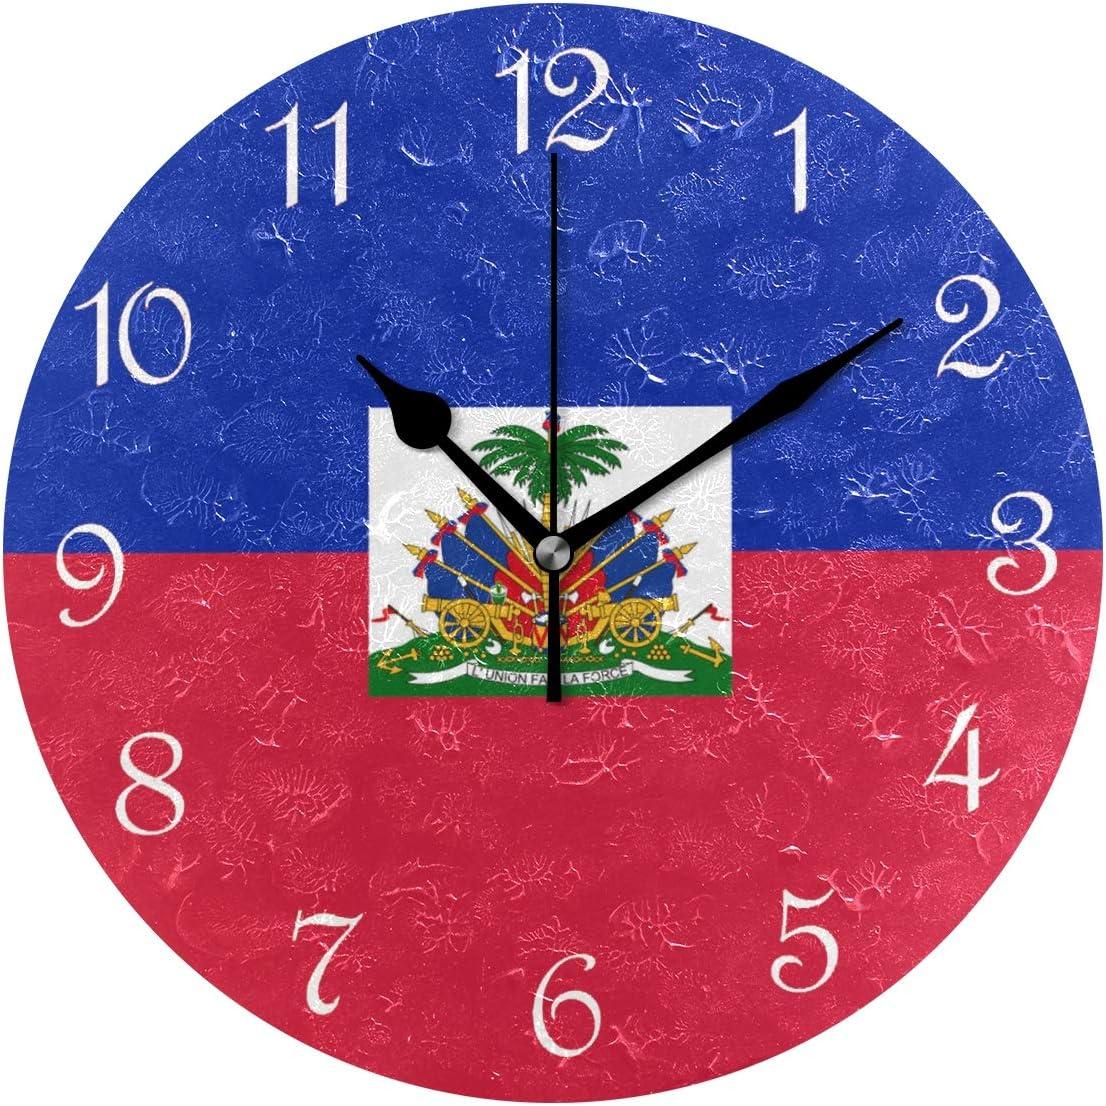 "Nugier Haiti Flag Round Wall Clock Silent Non Ticking Custom Acrylic Painted Easy to Read Non-Ticking Home Art Bedroom Living Dorm Room Decor 9.45""x9.45"""